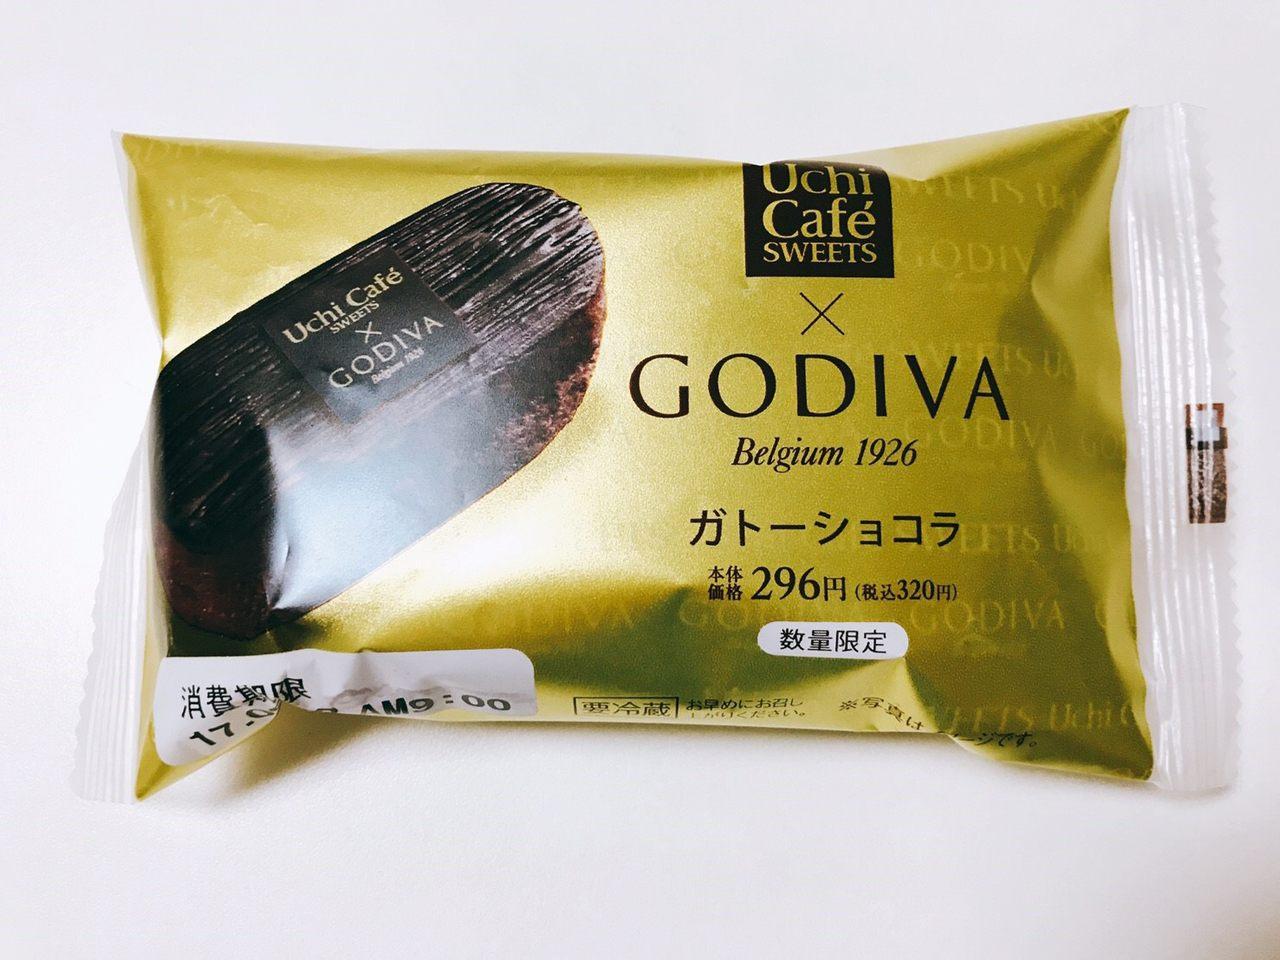 Uchi Café SWEETS×GODIVA 巧克力蛋糕